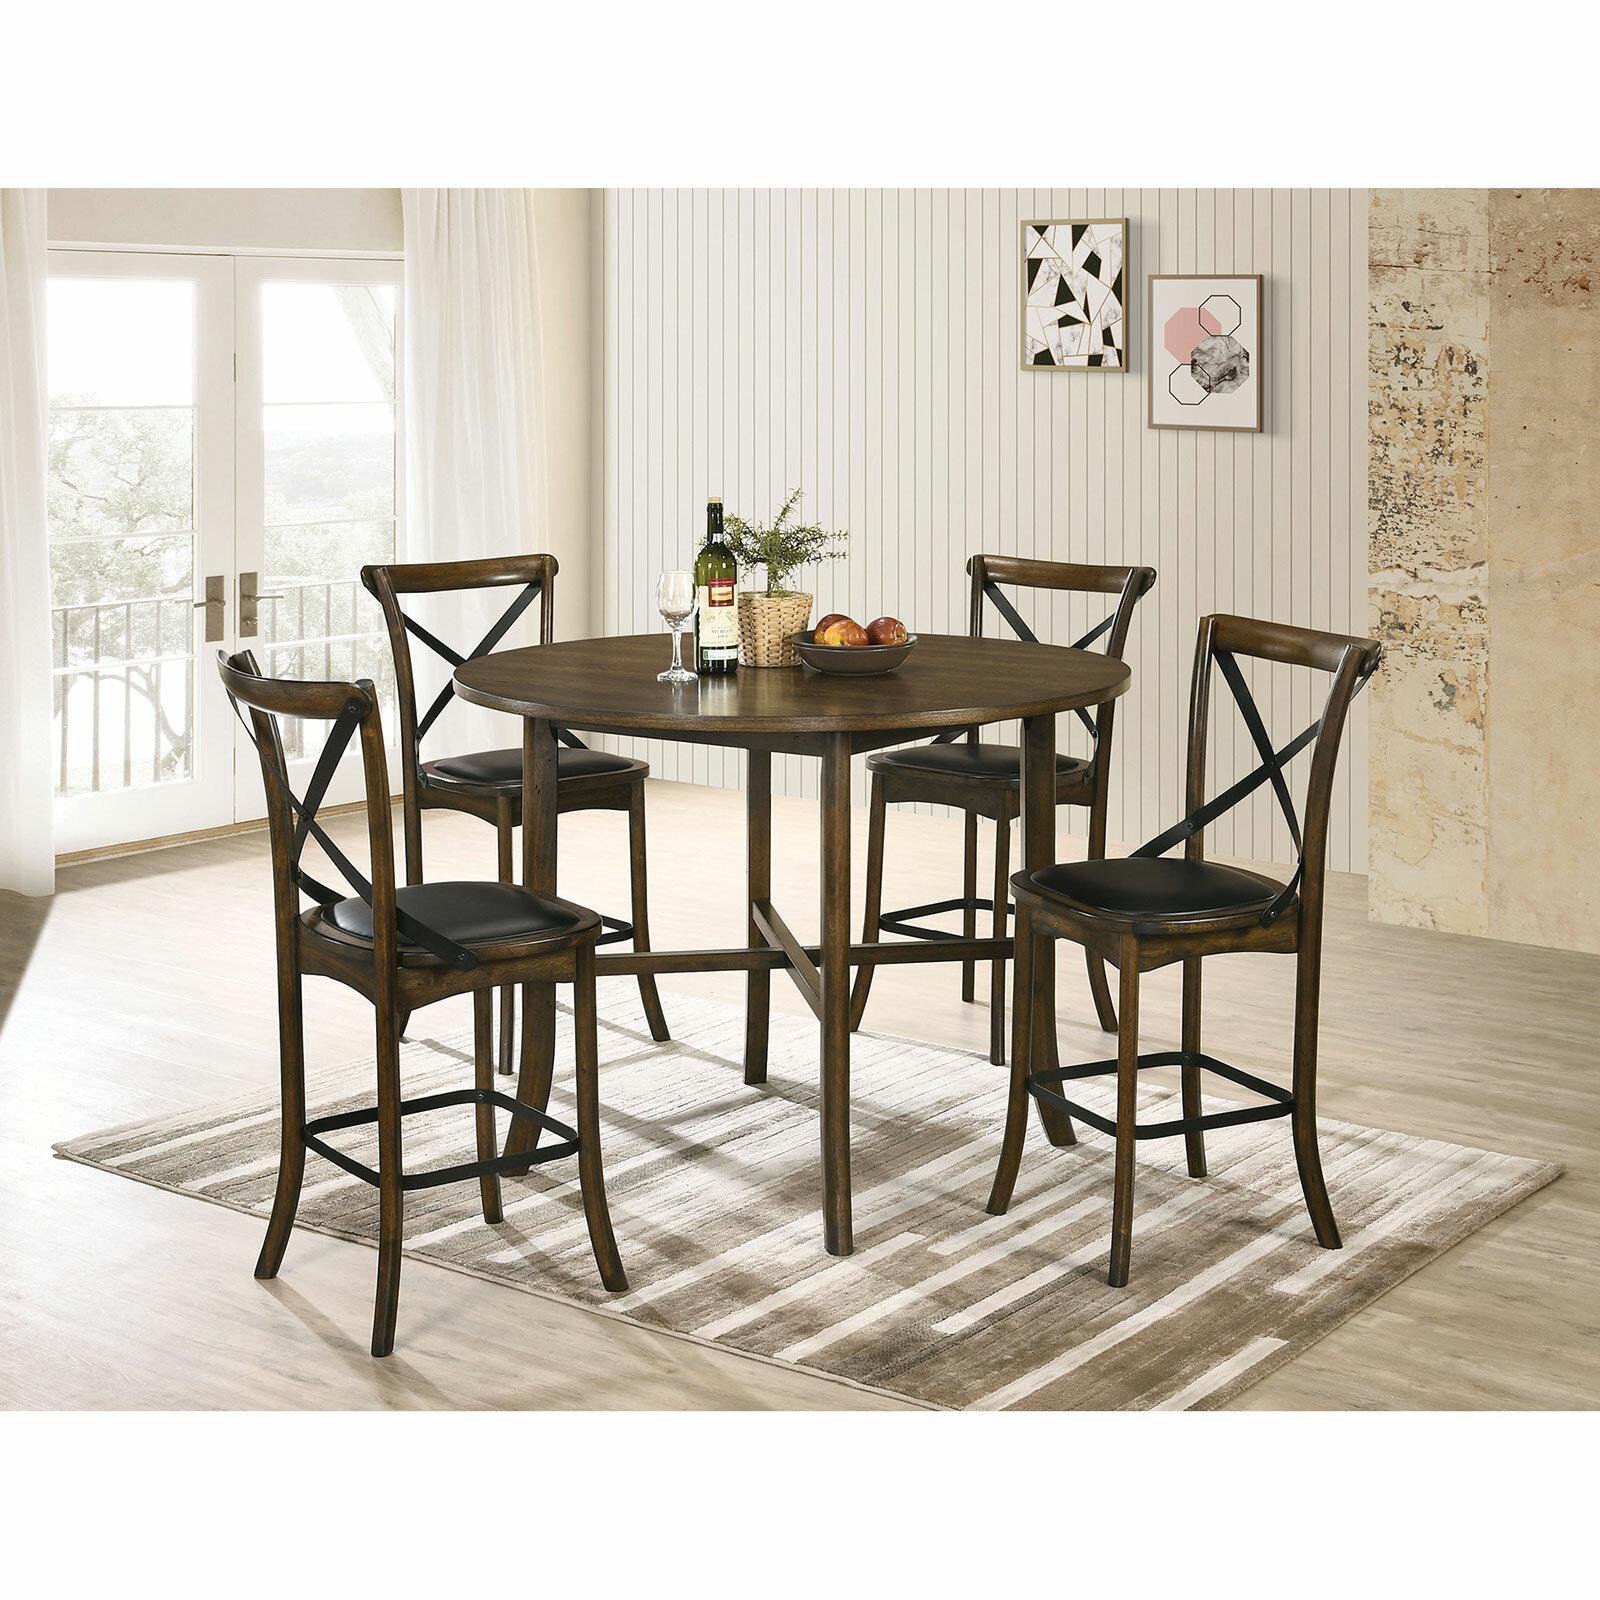 Gracie Oaks Torrence Placer 5 Piece Counter Height Dining Set Wayfair